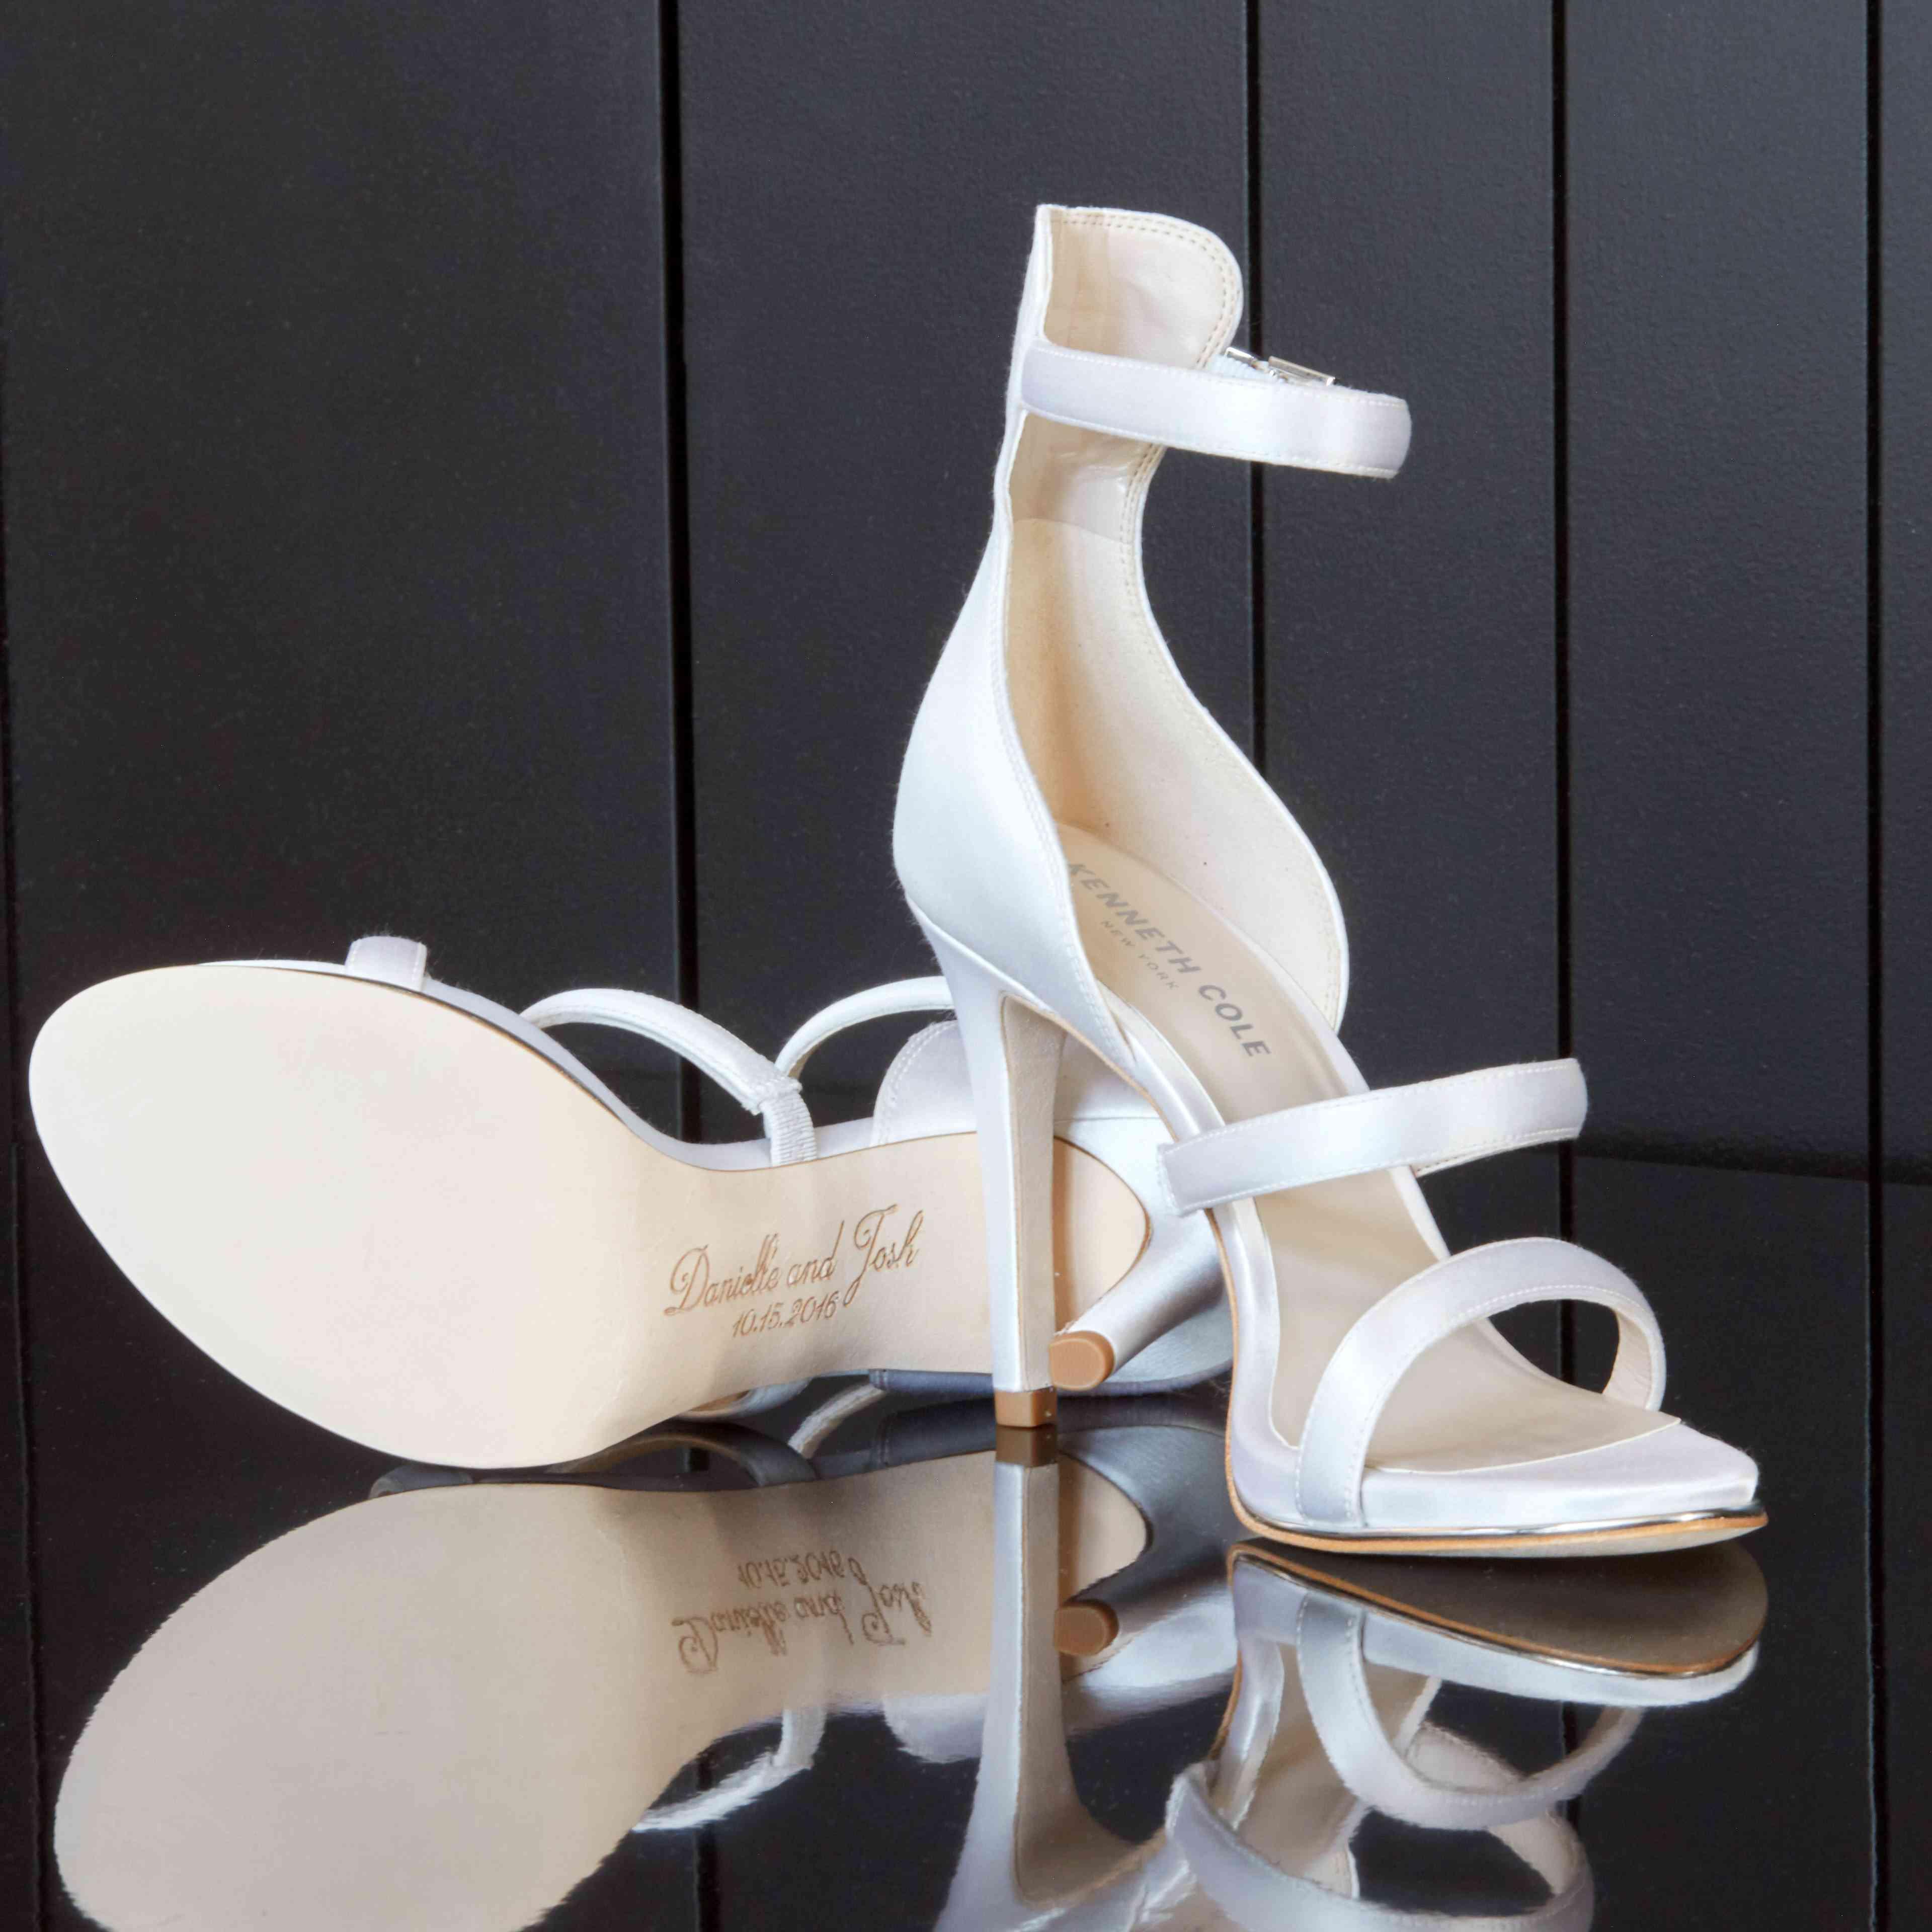 Kenneth Cole Wedding Shoes